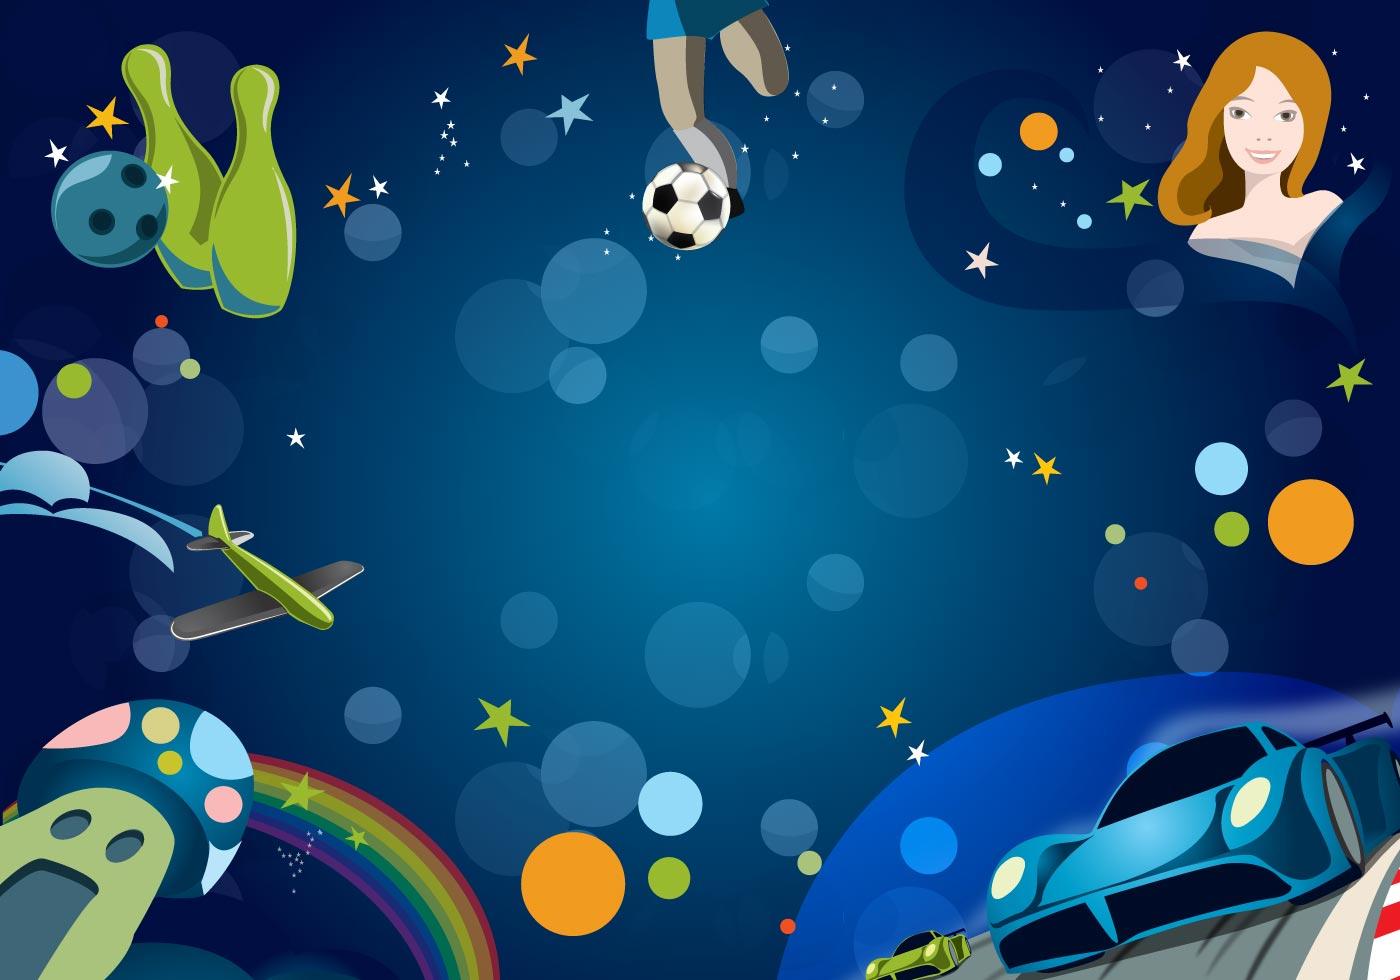 sports background designs - photo #16